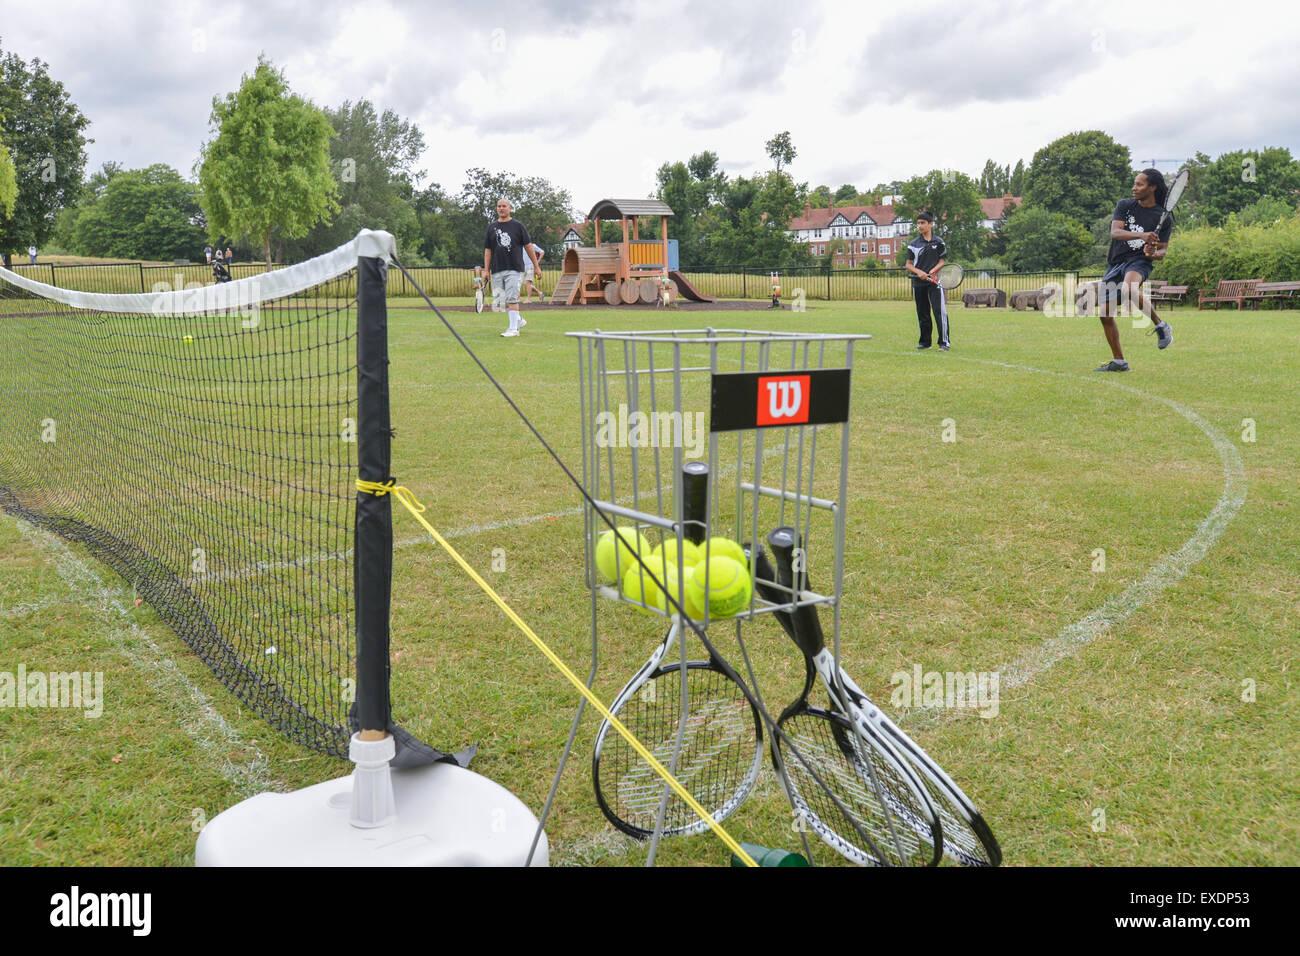 Hampstead Heath, London, UK. 12th July 2015. People playing T3 three a side tennis on Hampstead Heath © Matthew Stock Photo